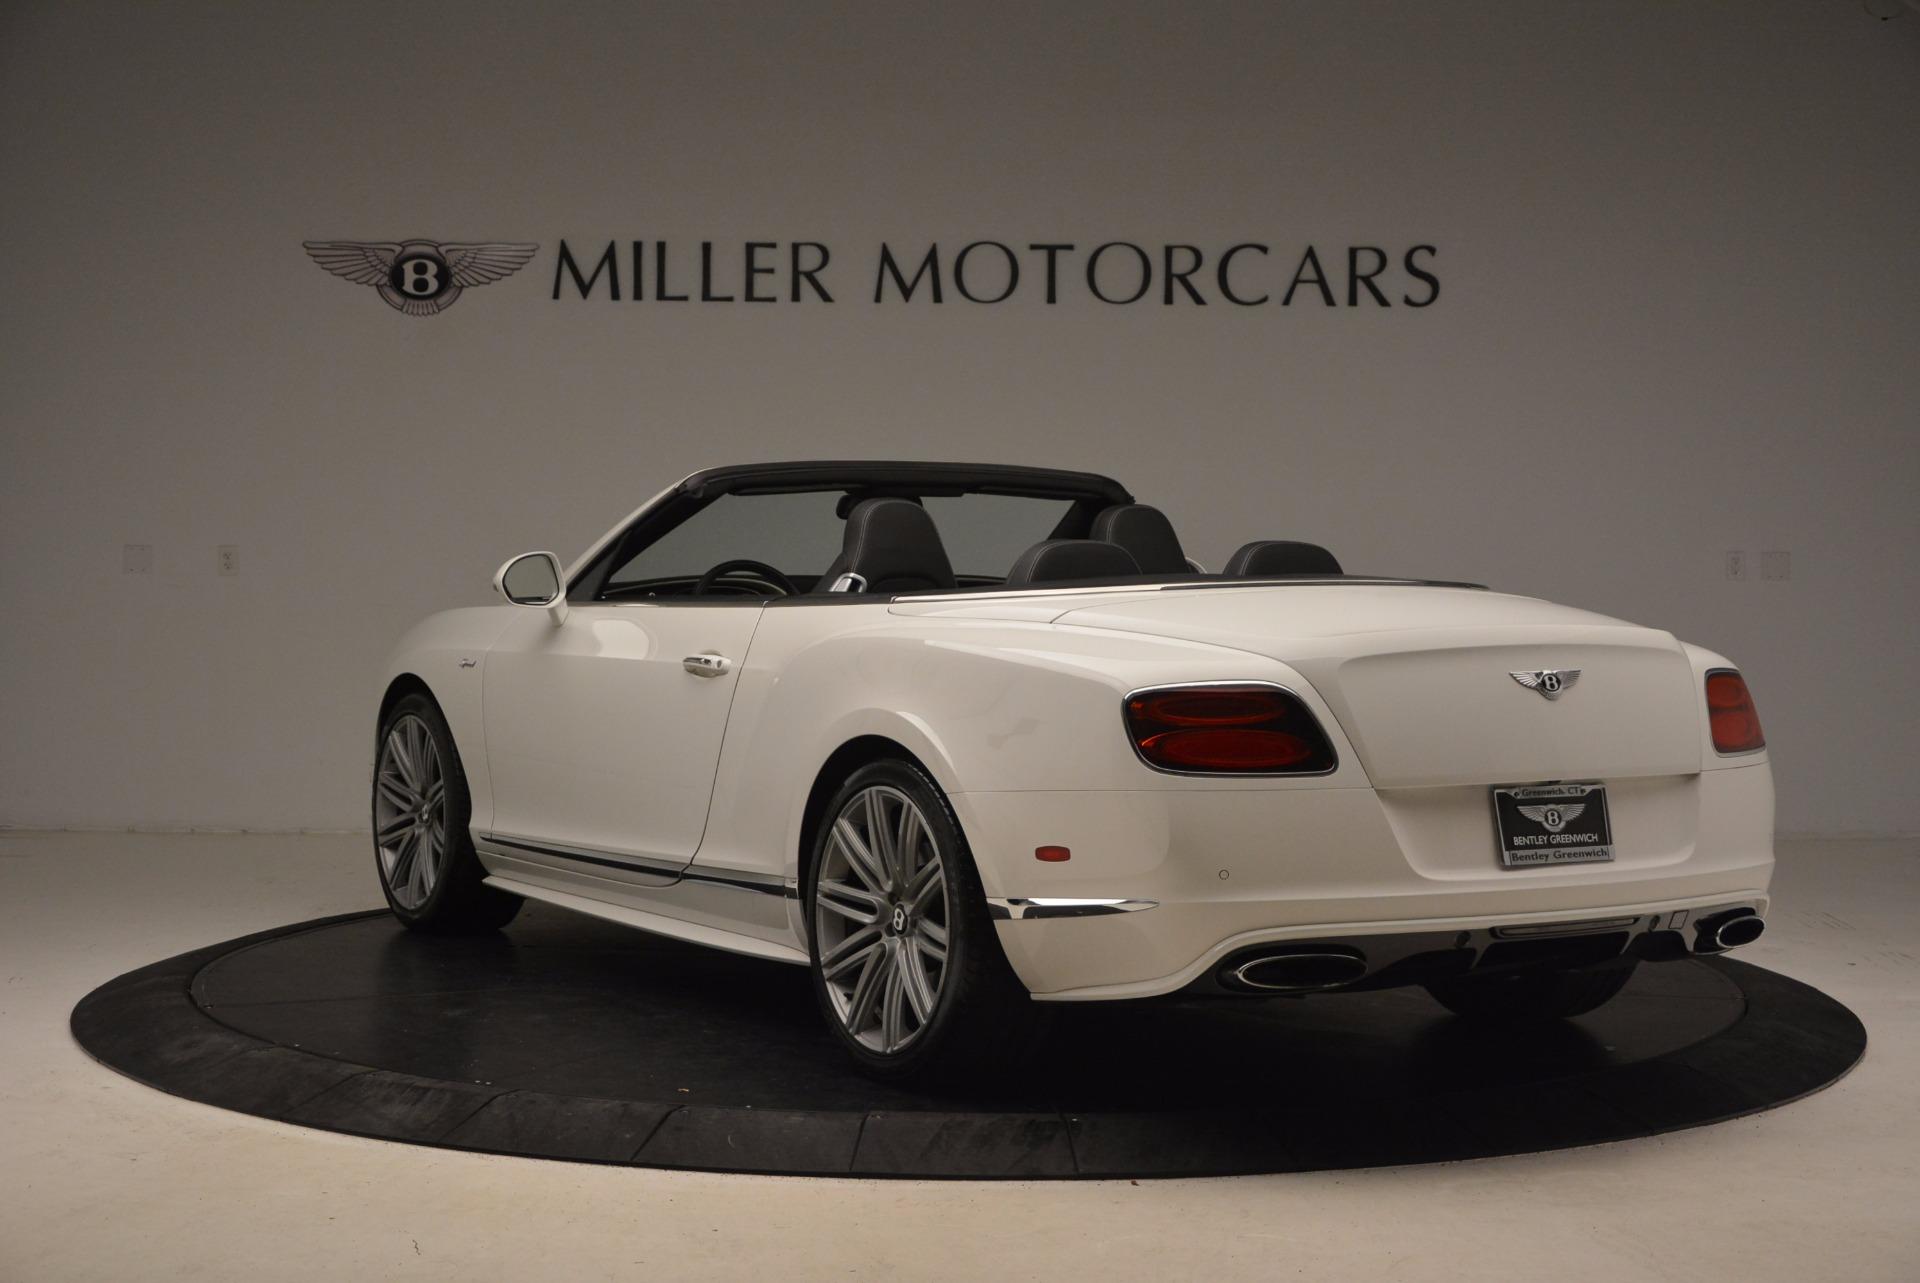 Used 2015 Bentley Continental GT Speed For Sale In Westport, CT 1714_p5